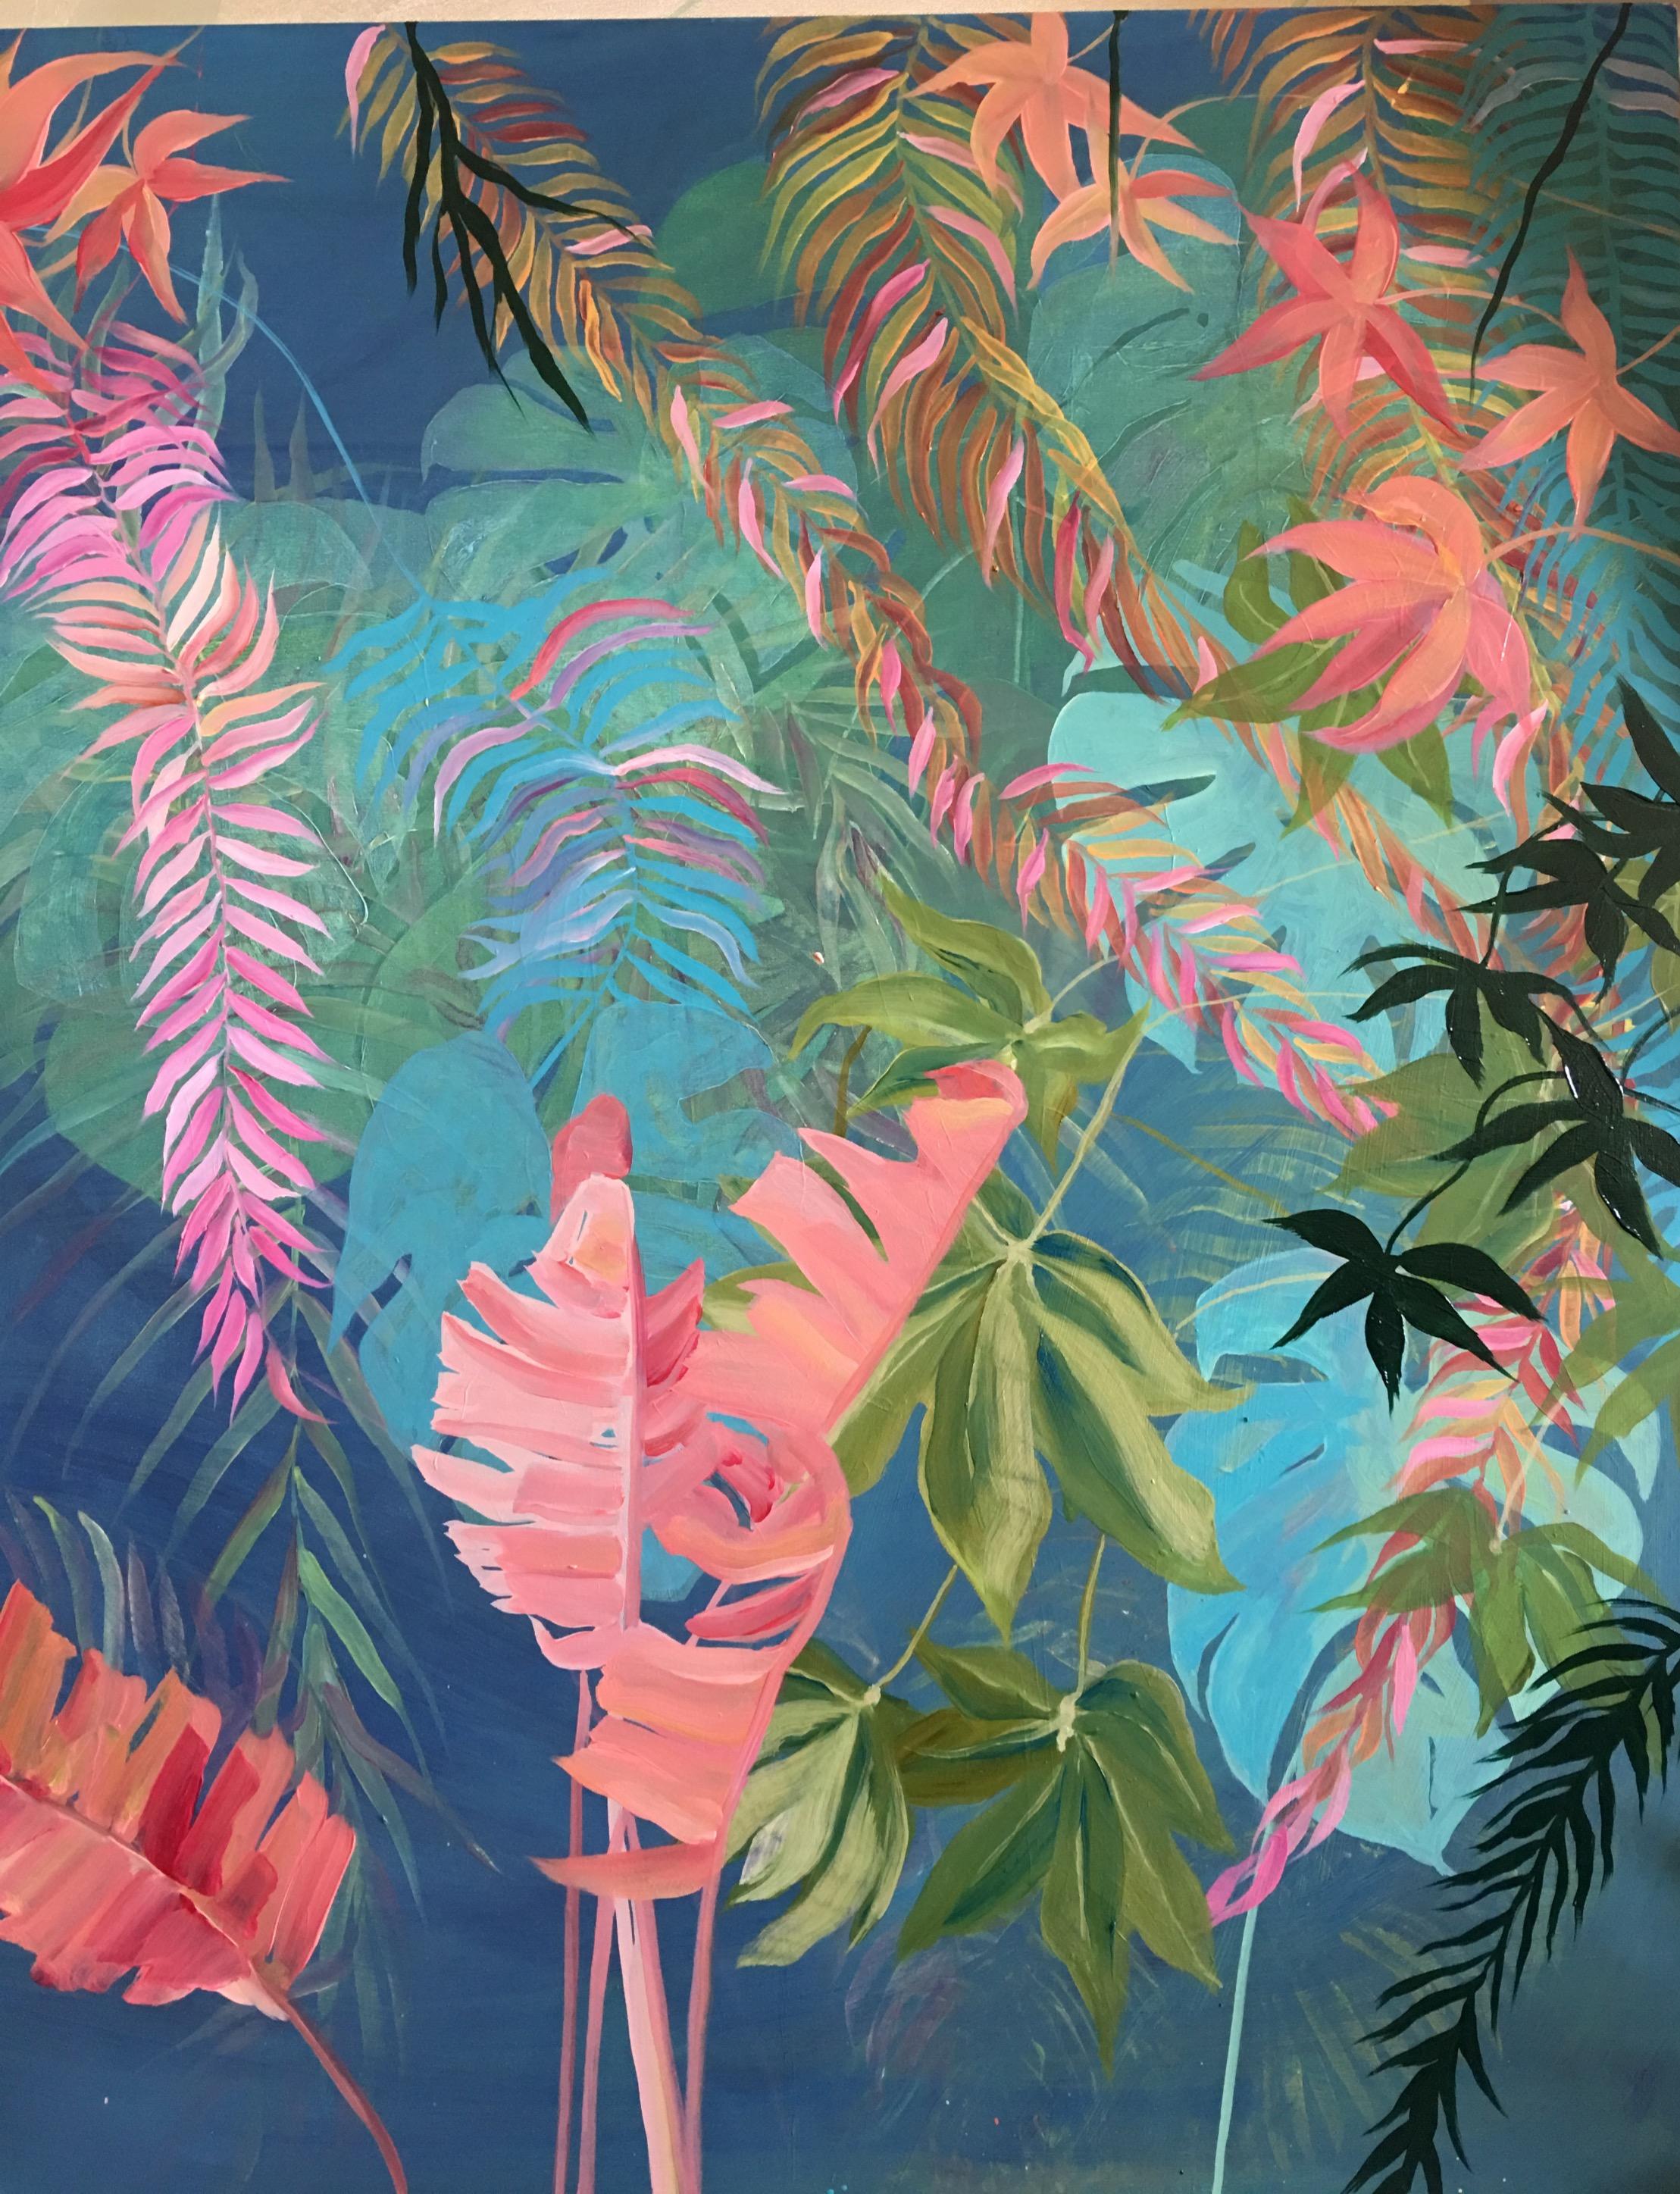 Tropical pinks